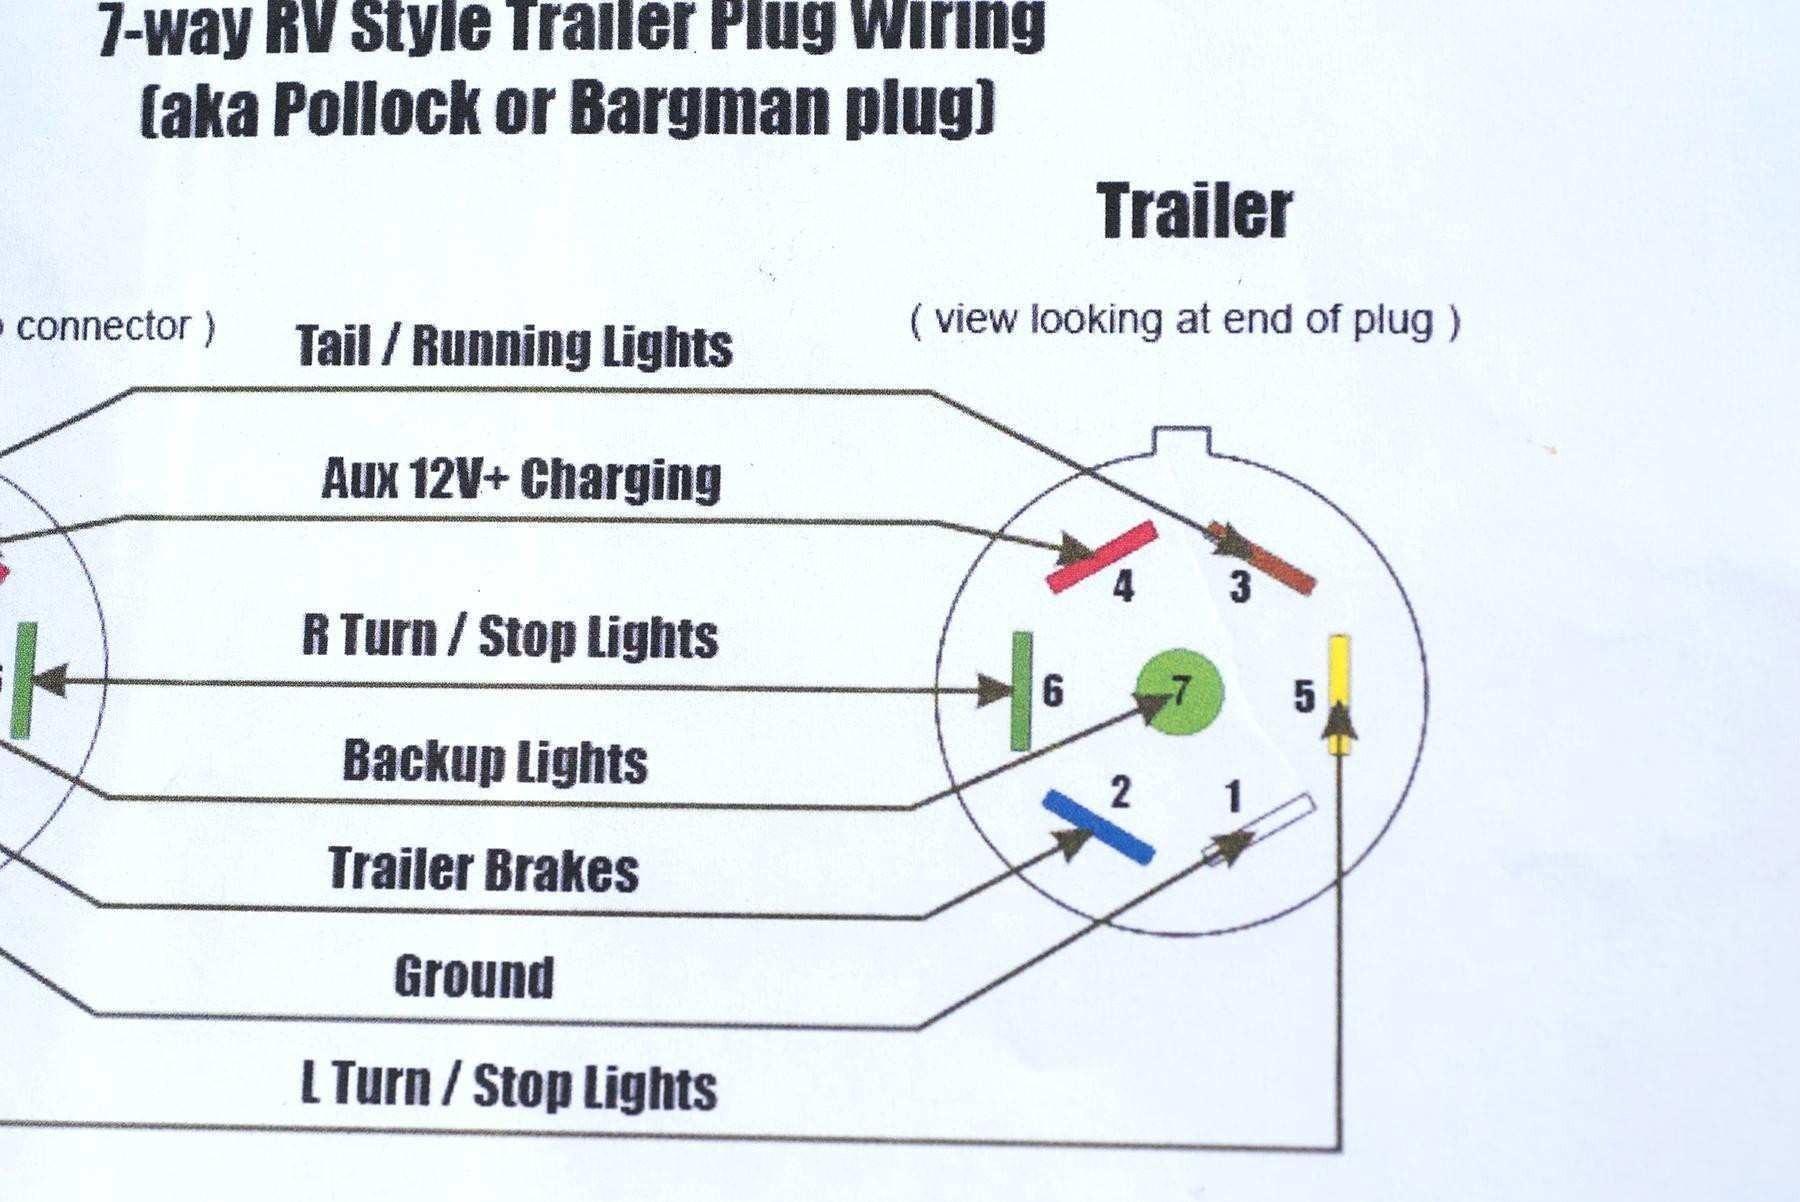 7 Way Trailer Plug Wiring Diagram 7 Wire Rv Diagram Wiring Diagrams Konsult Of 7 Way Trailer Plug Wiring Diagram